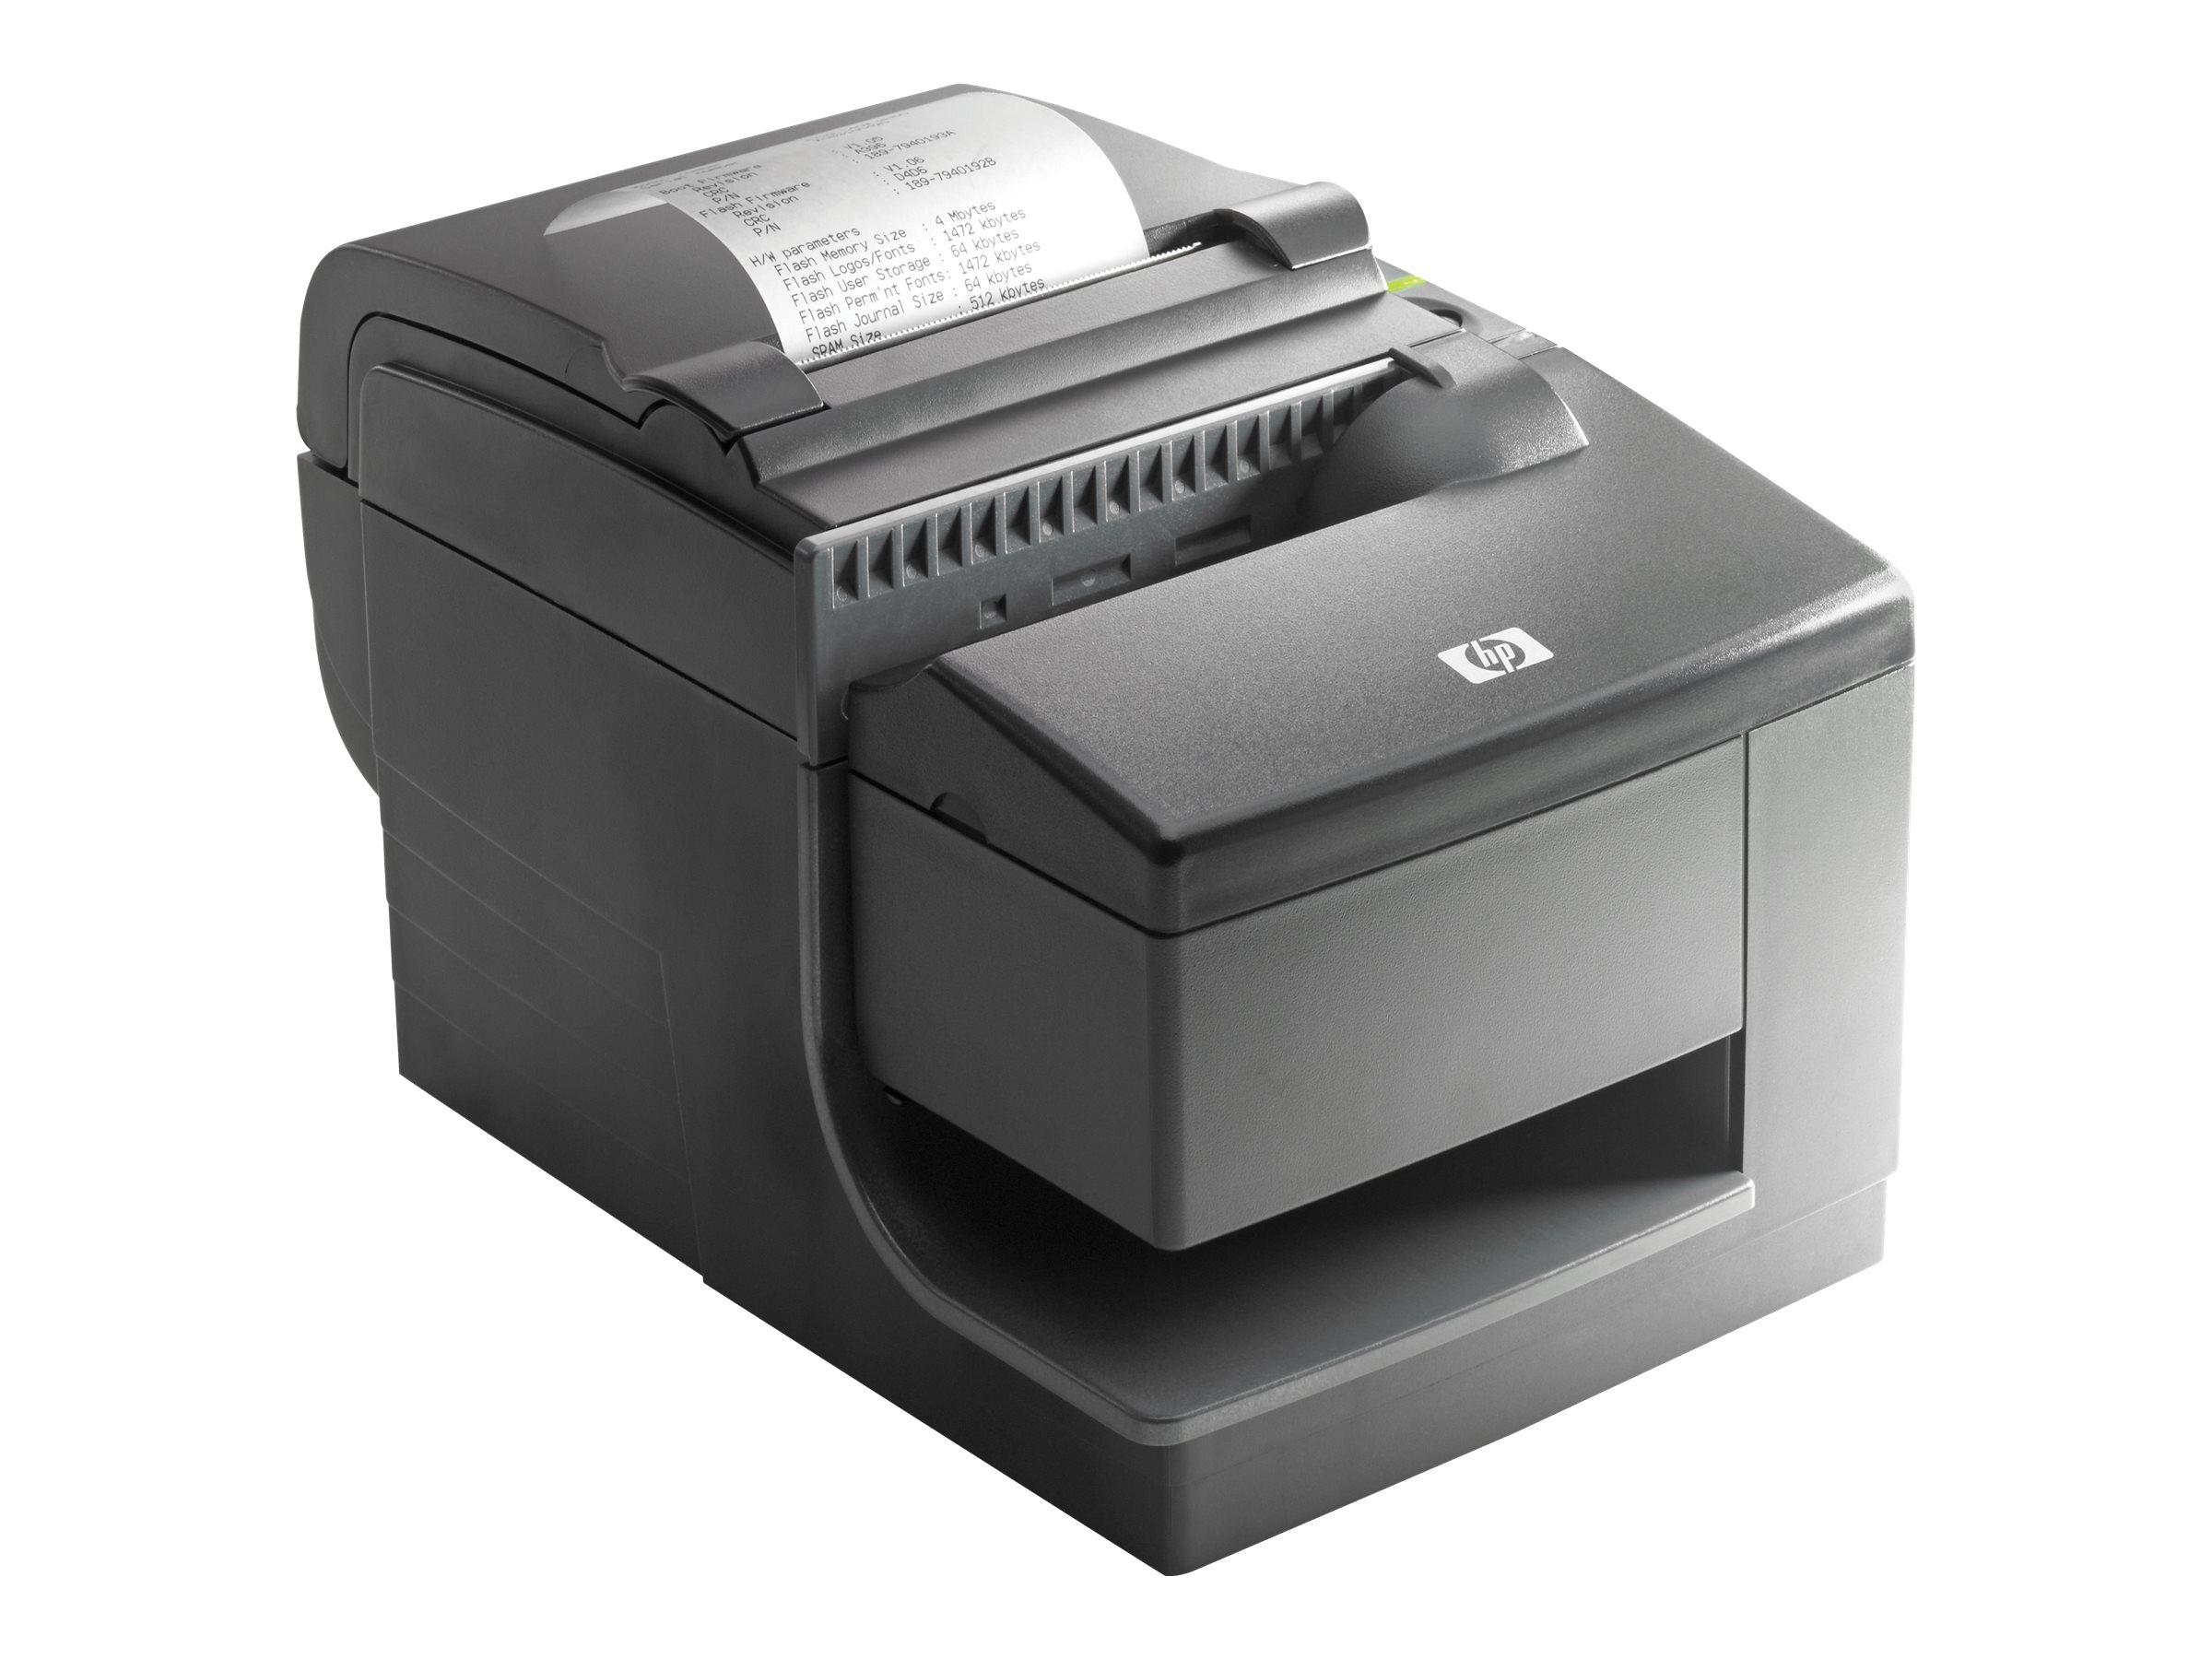 HP Hybrid Thermal Printer with MICR - Belegdrucker - zweifarbig (monochrom) - Thermodirekt - Rolle (0,8 cm) - 203 dpi